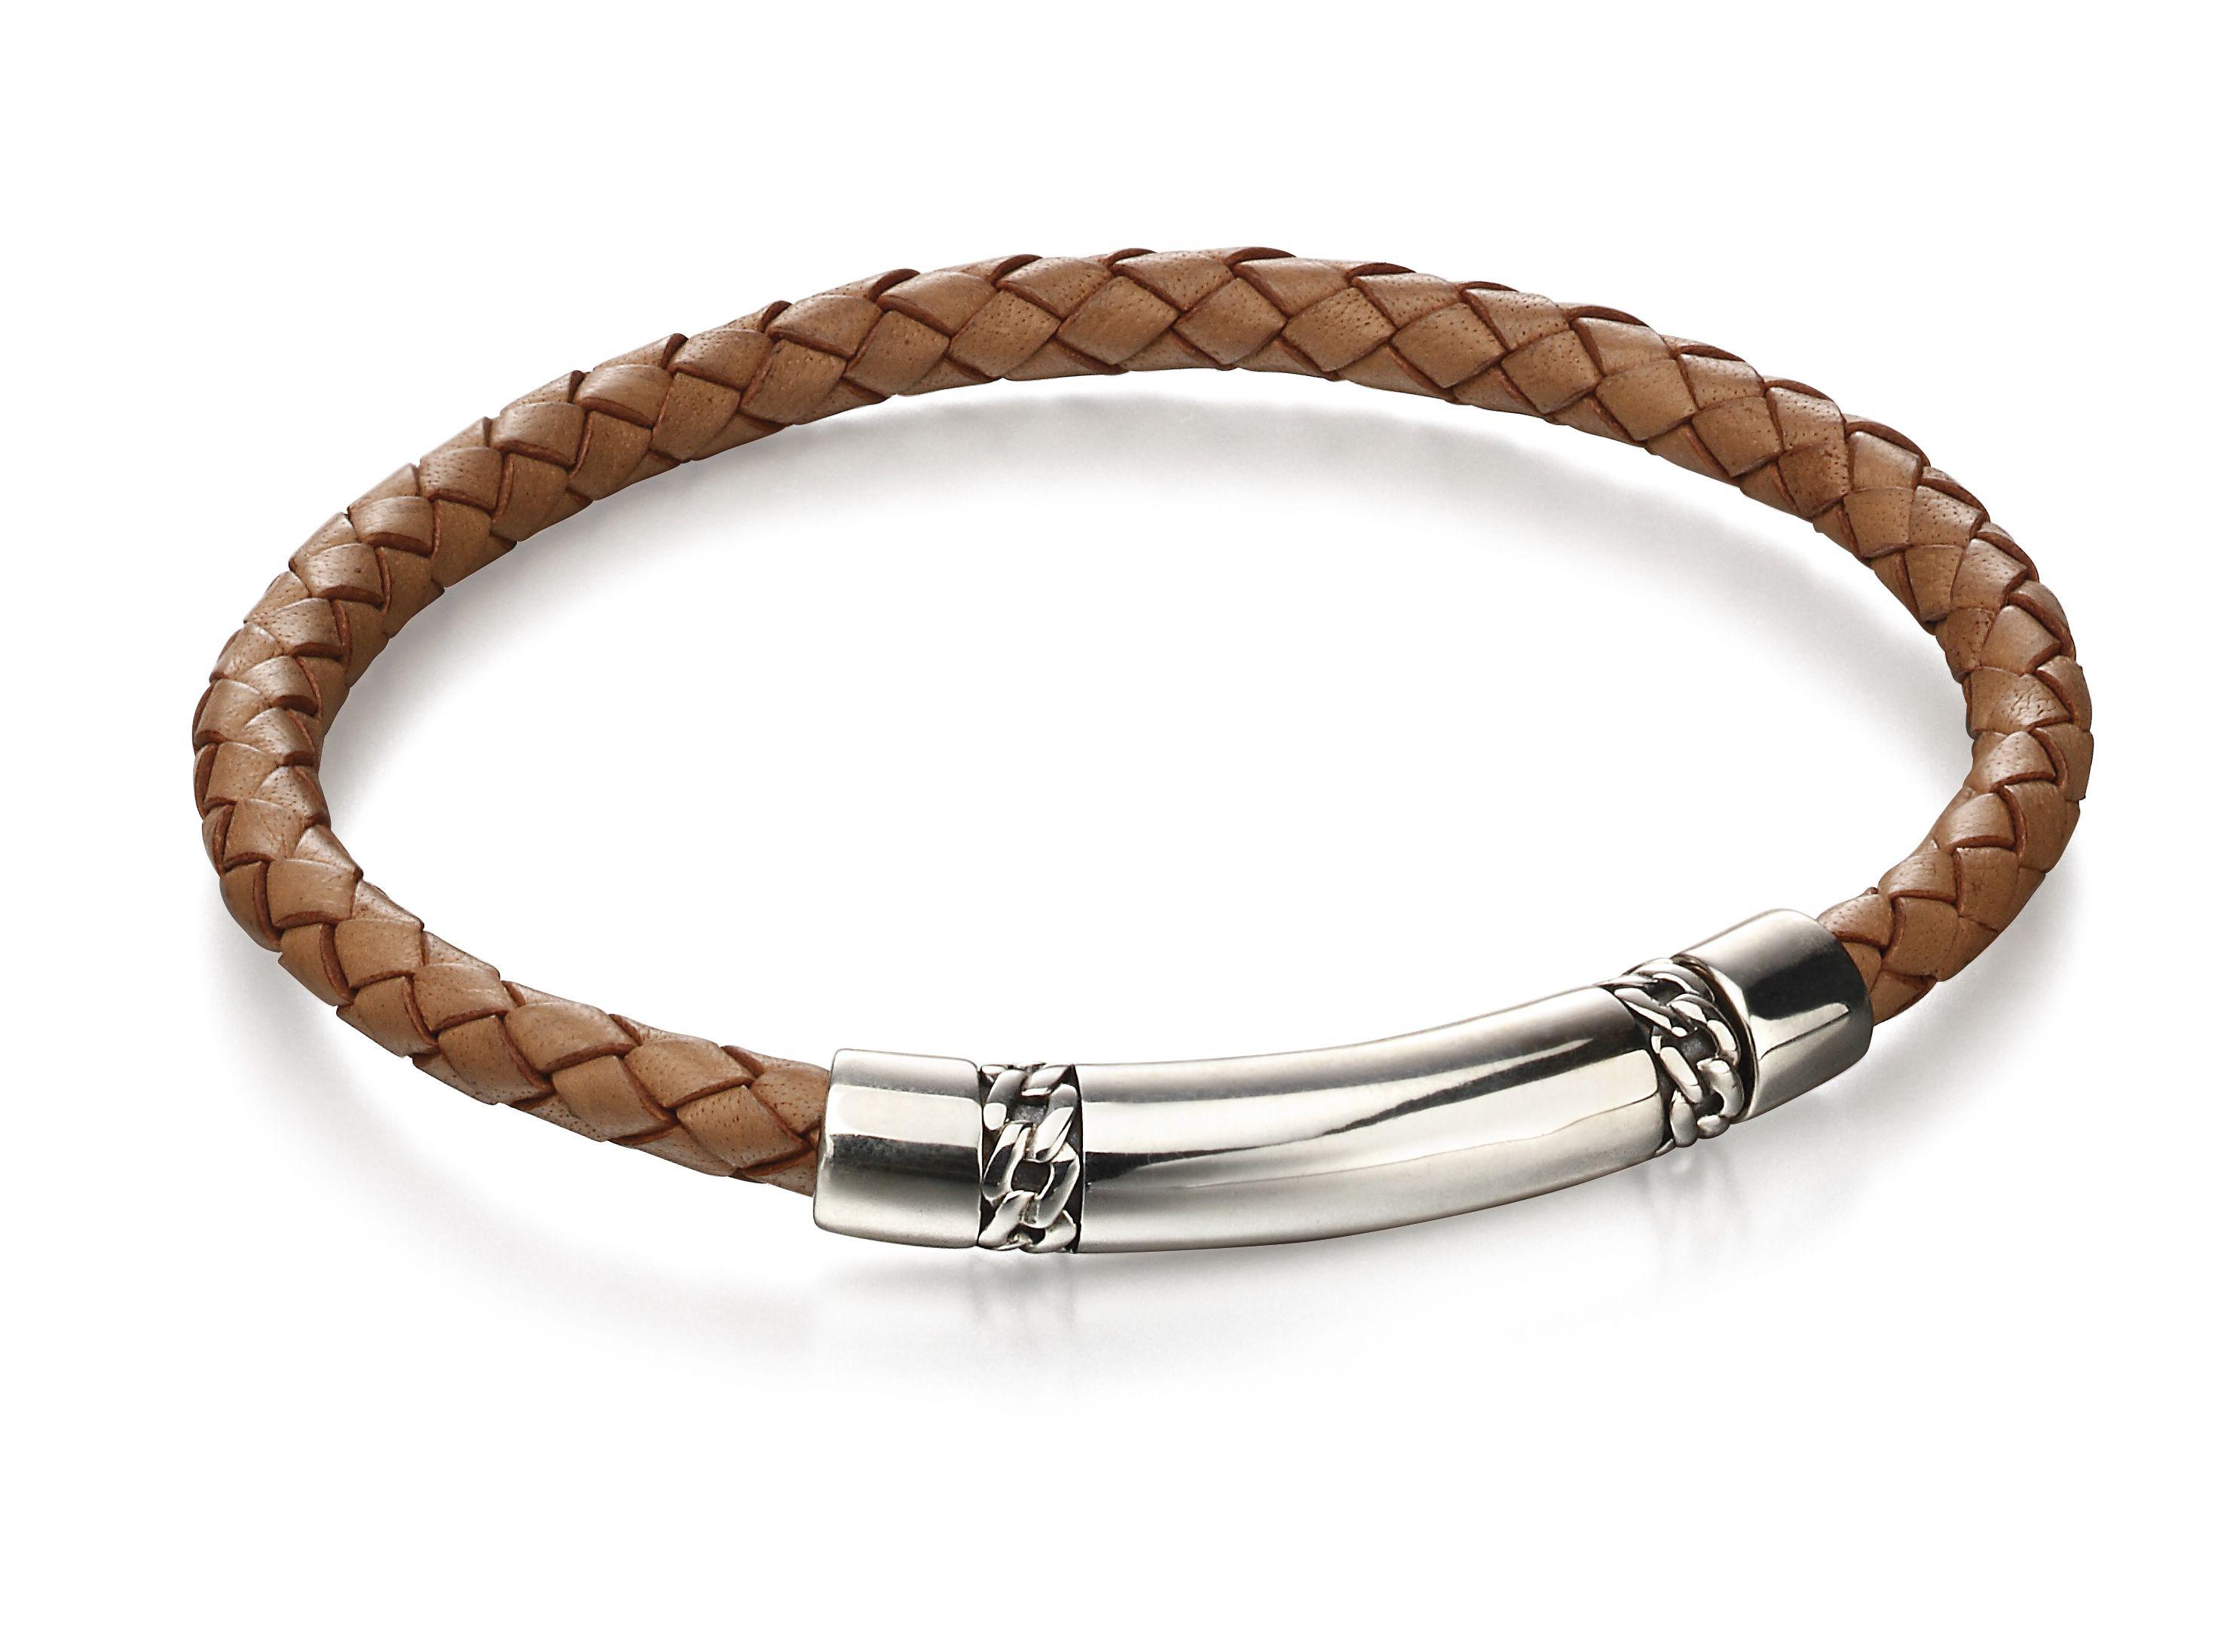 Fred Bennett Mens 925 Sterling Silver Tan Brown Woven Leather & Chain Detail Bracelet of Length 22cm